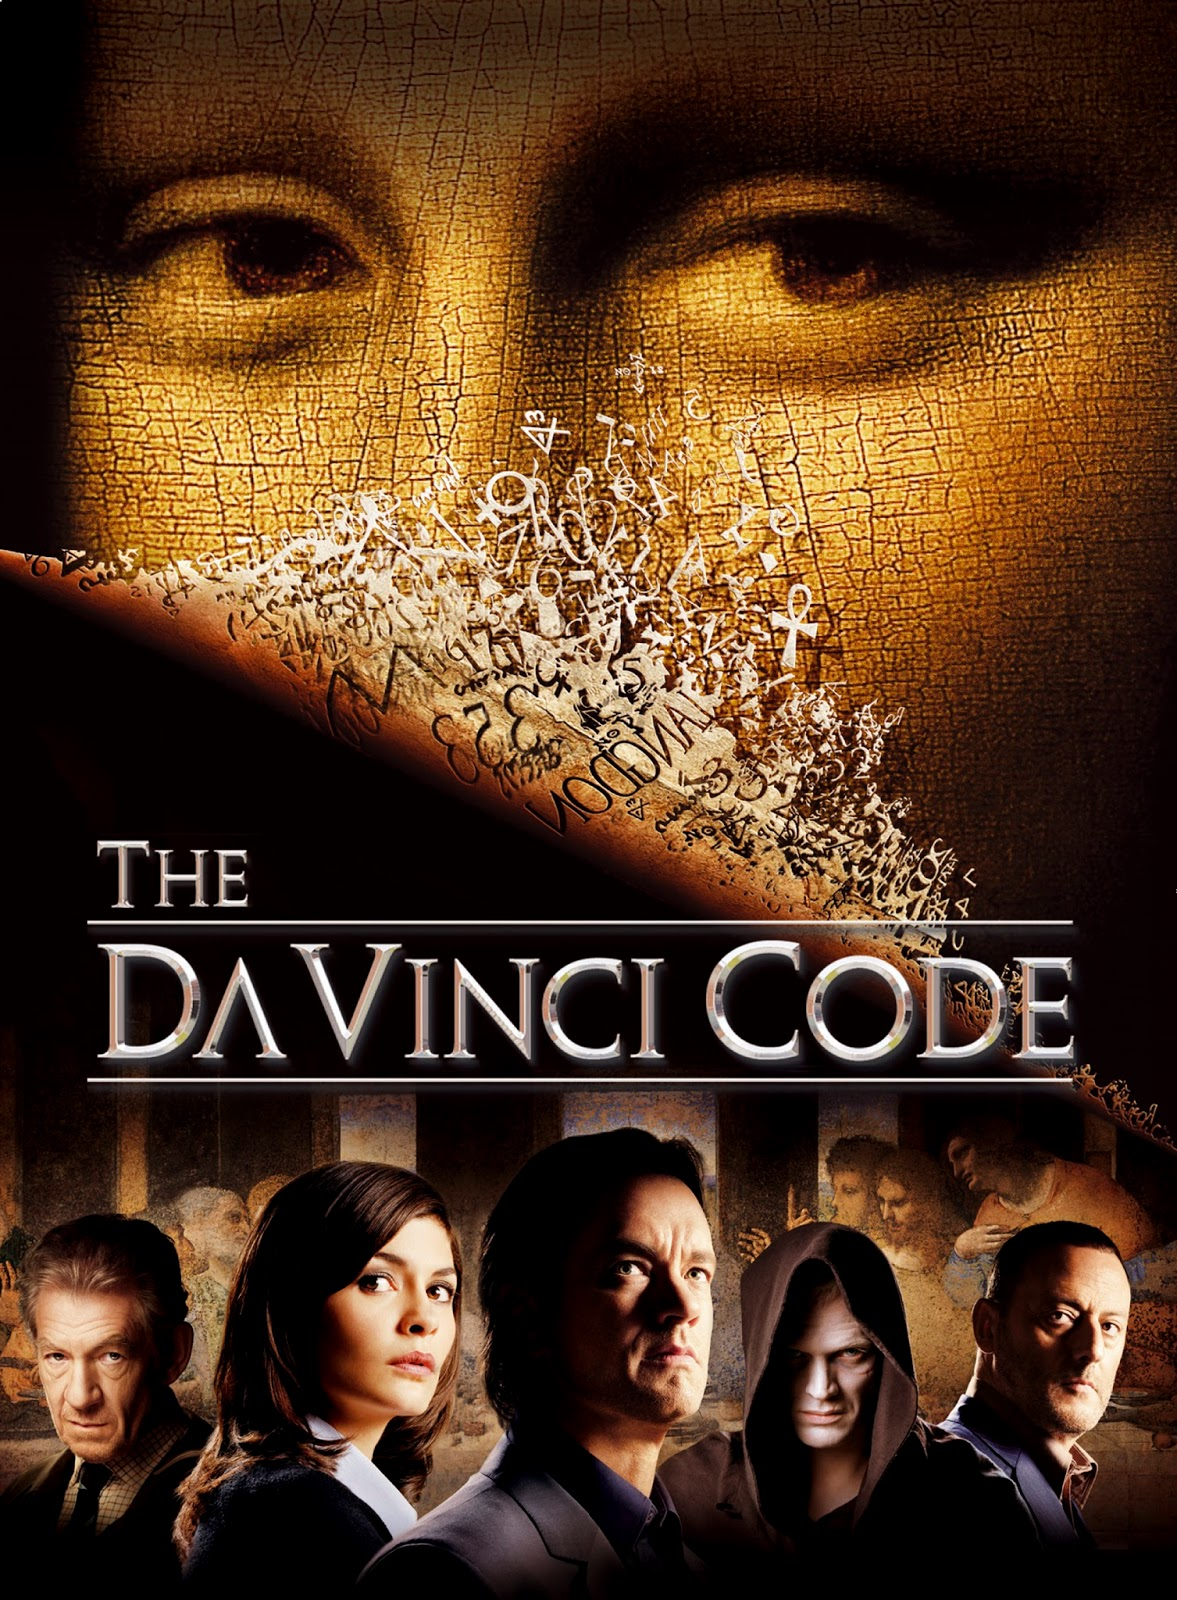 movie review the da vinci code Book review for the da vinci code by dan brown.